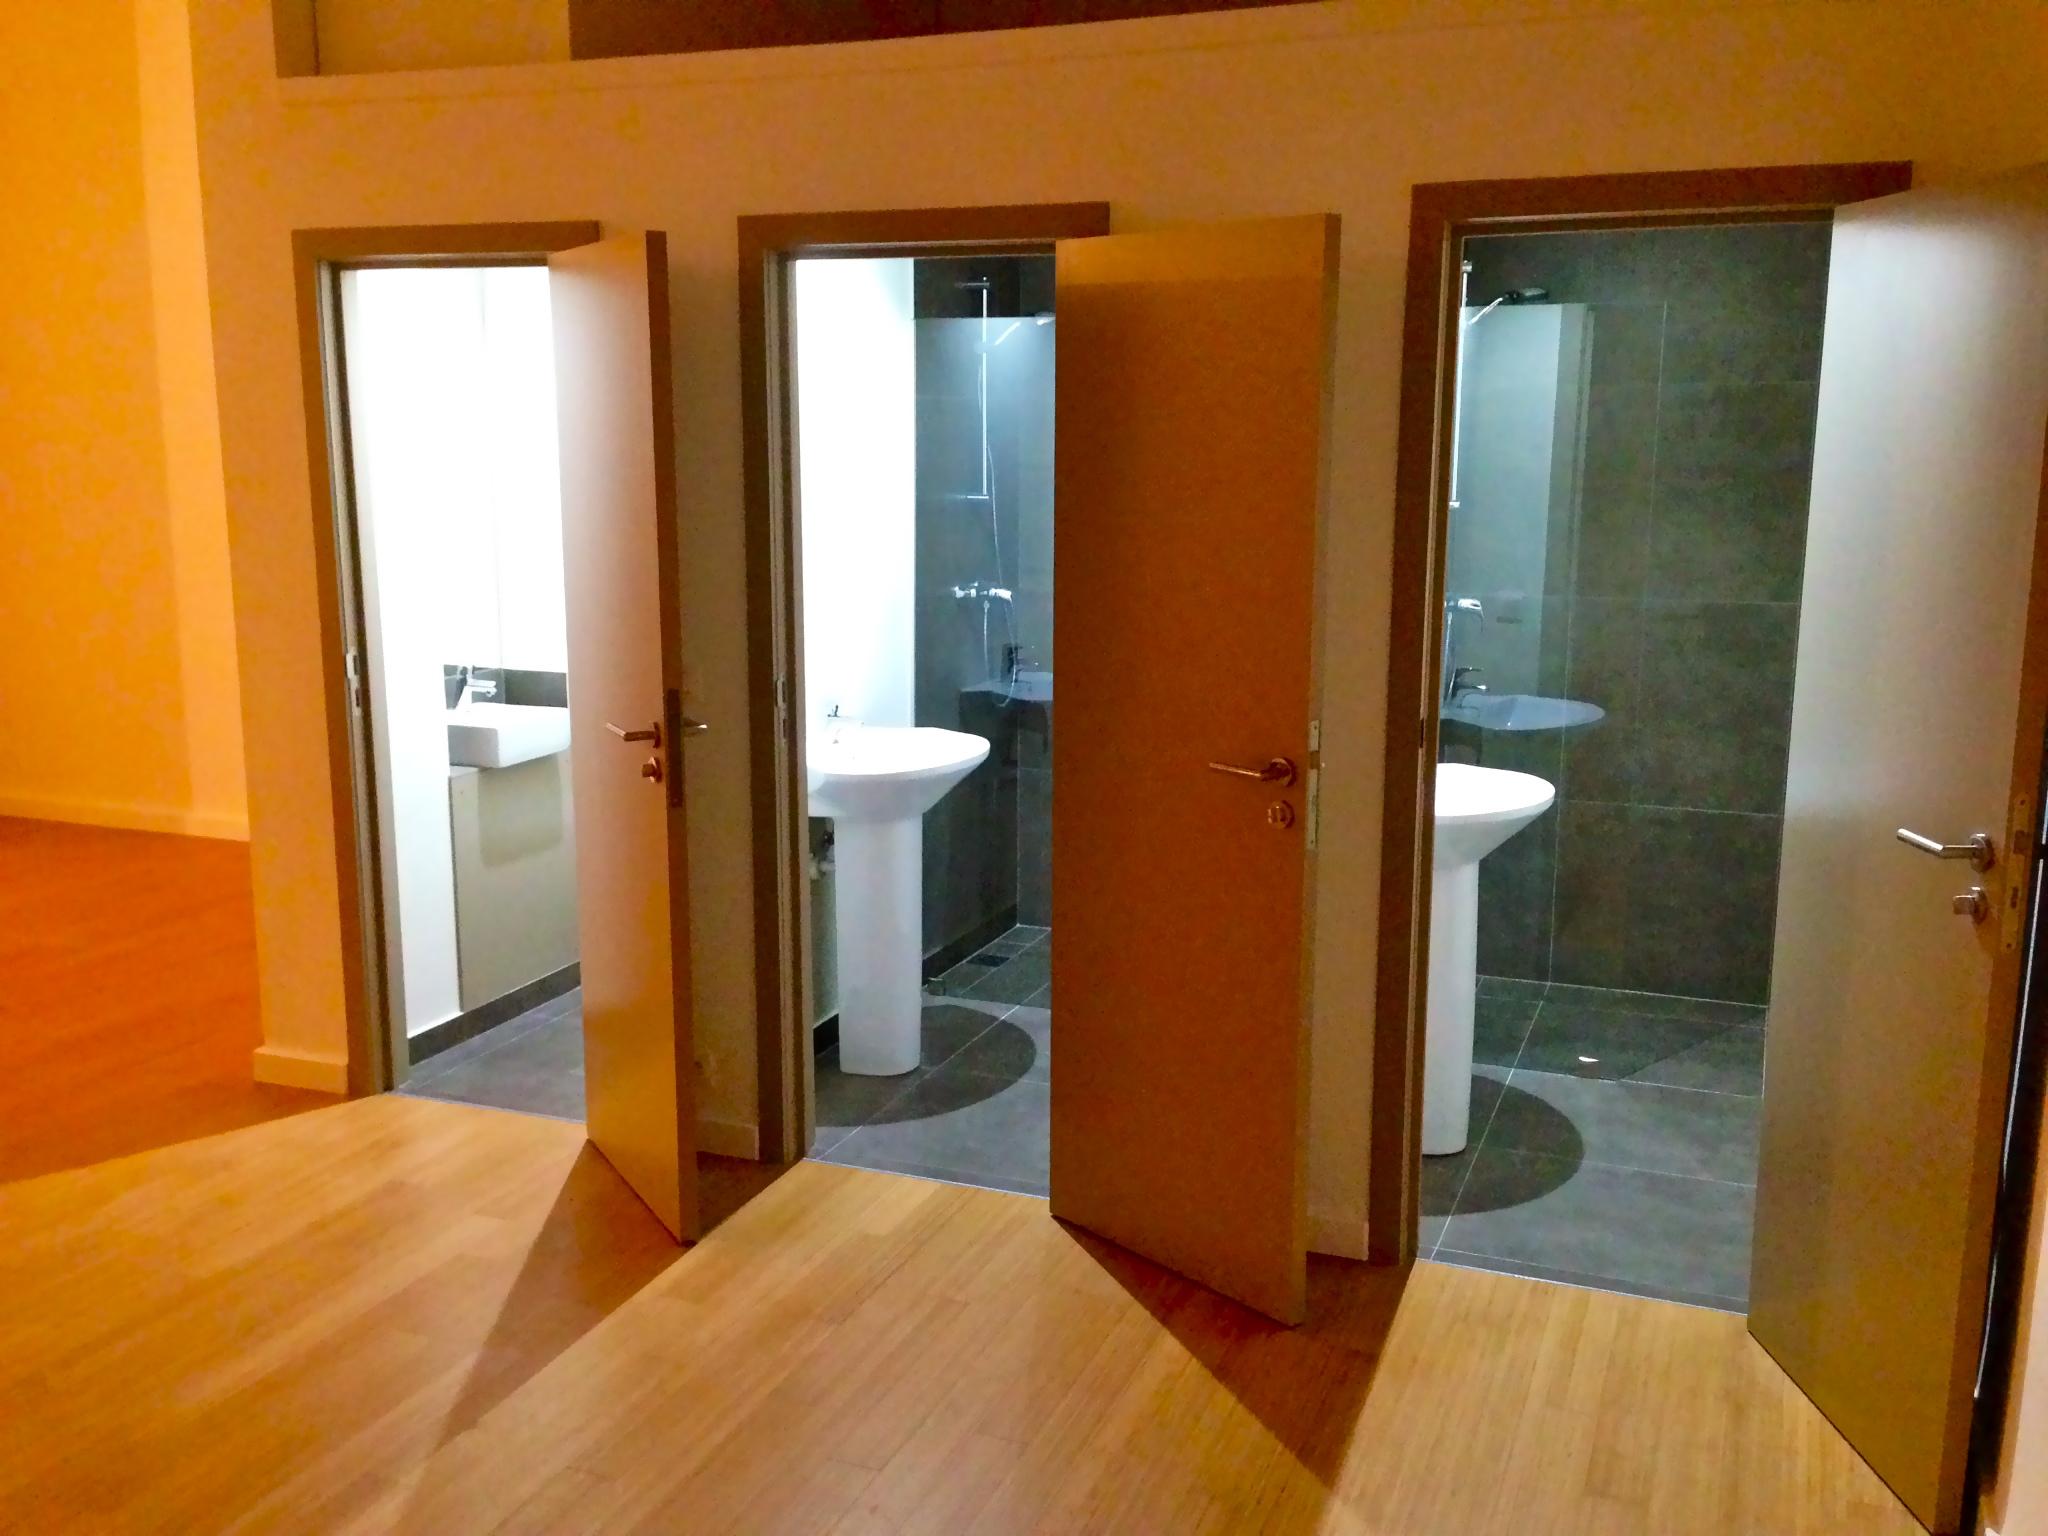 Vestiaires et toilette